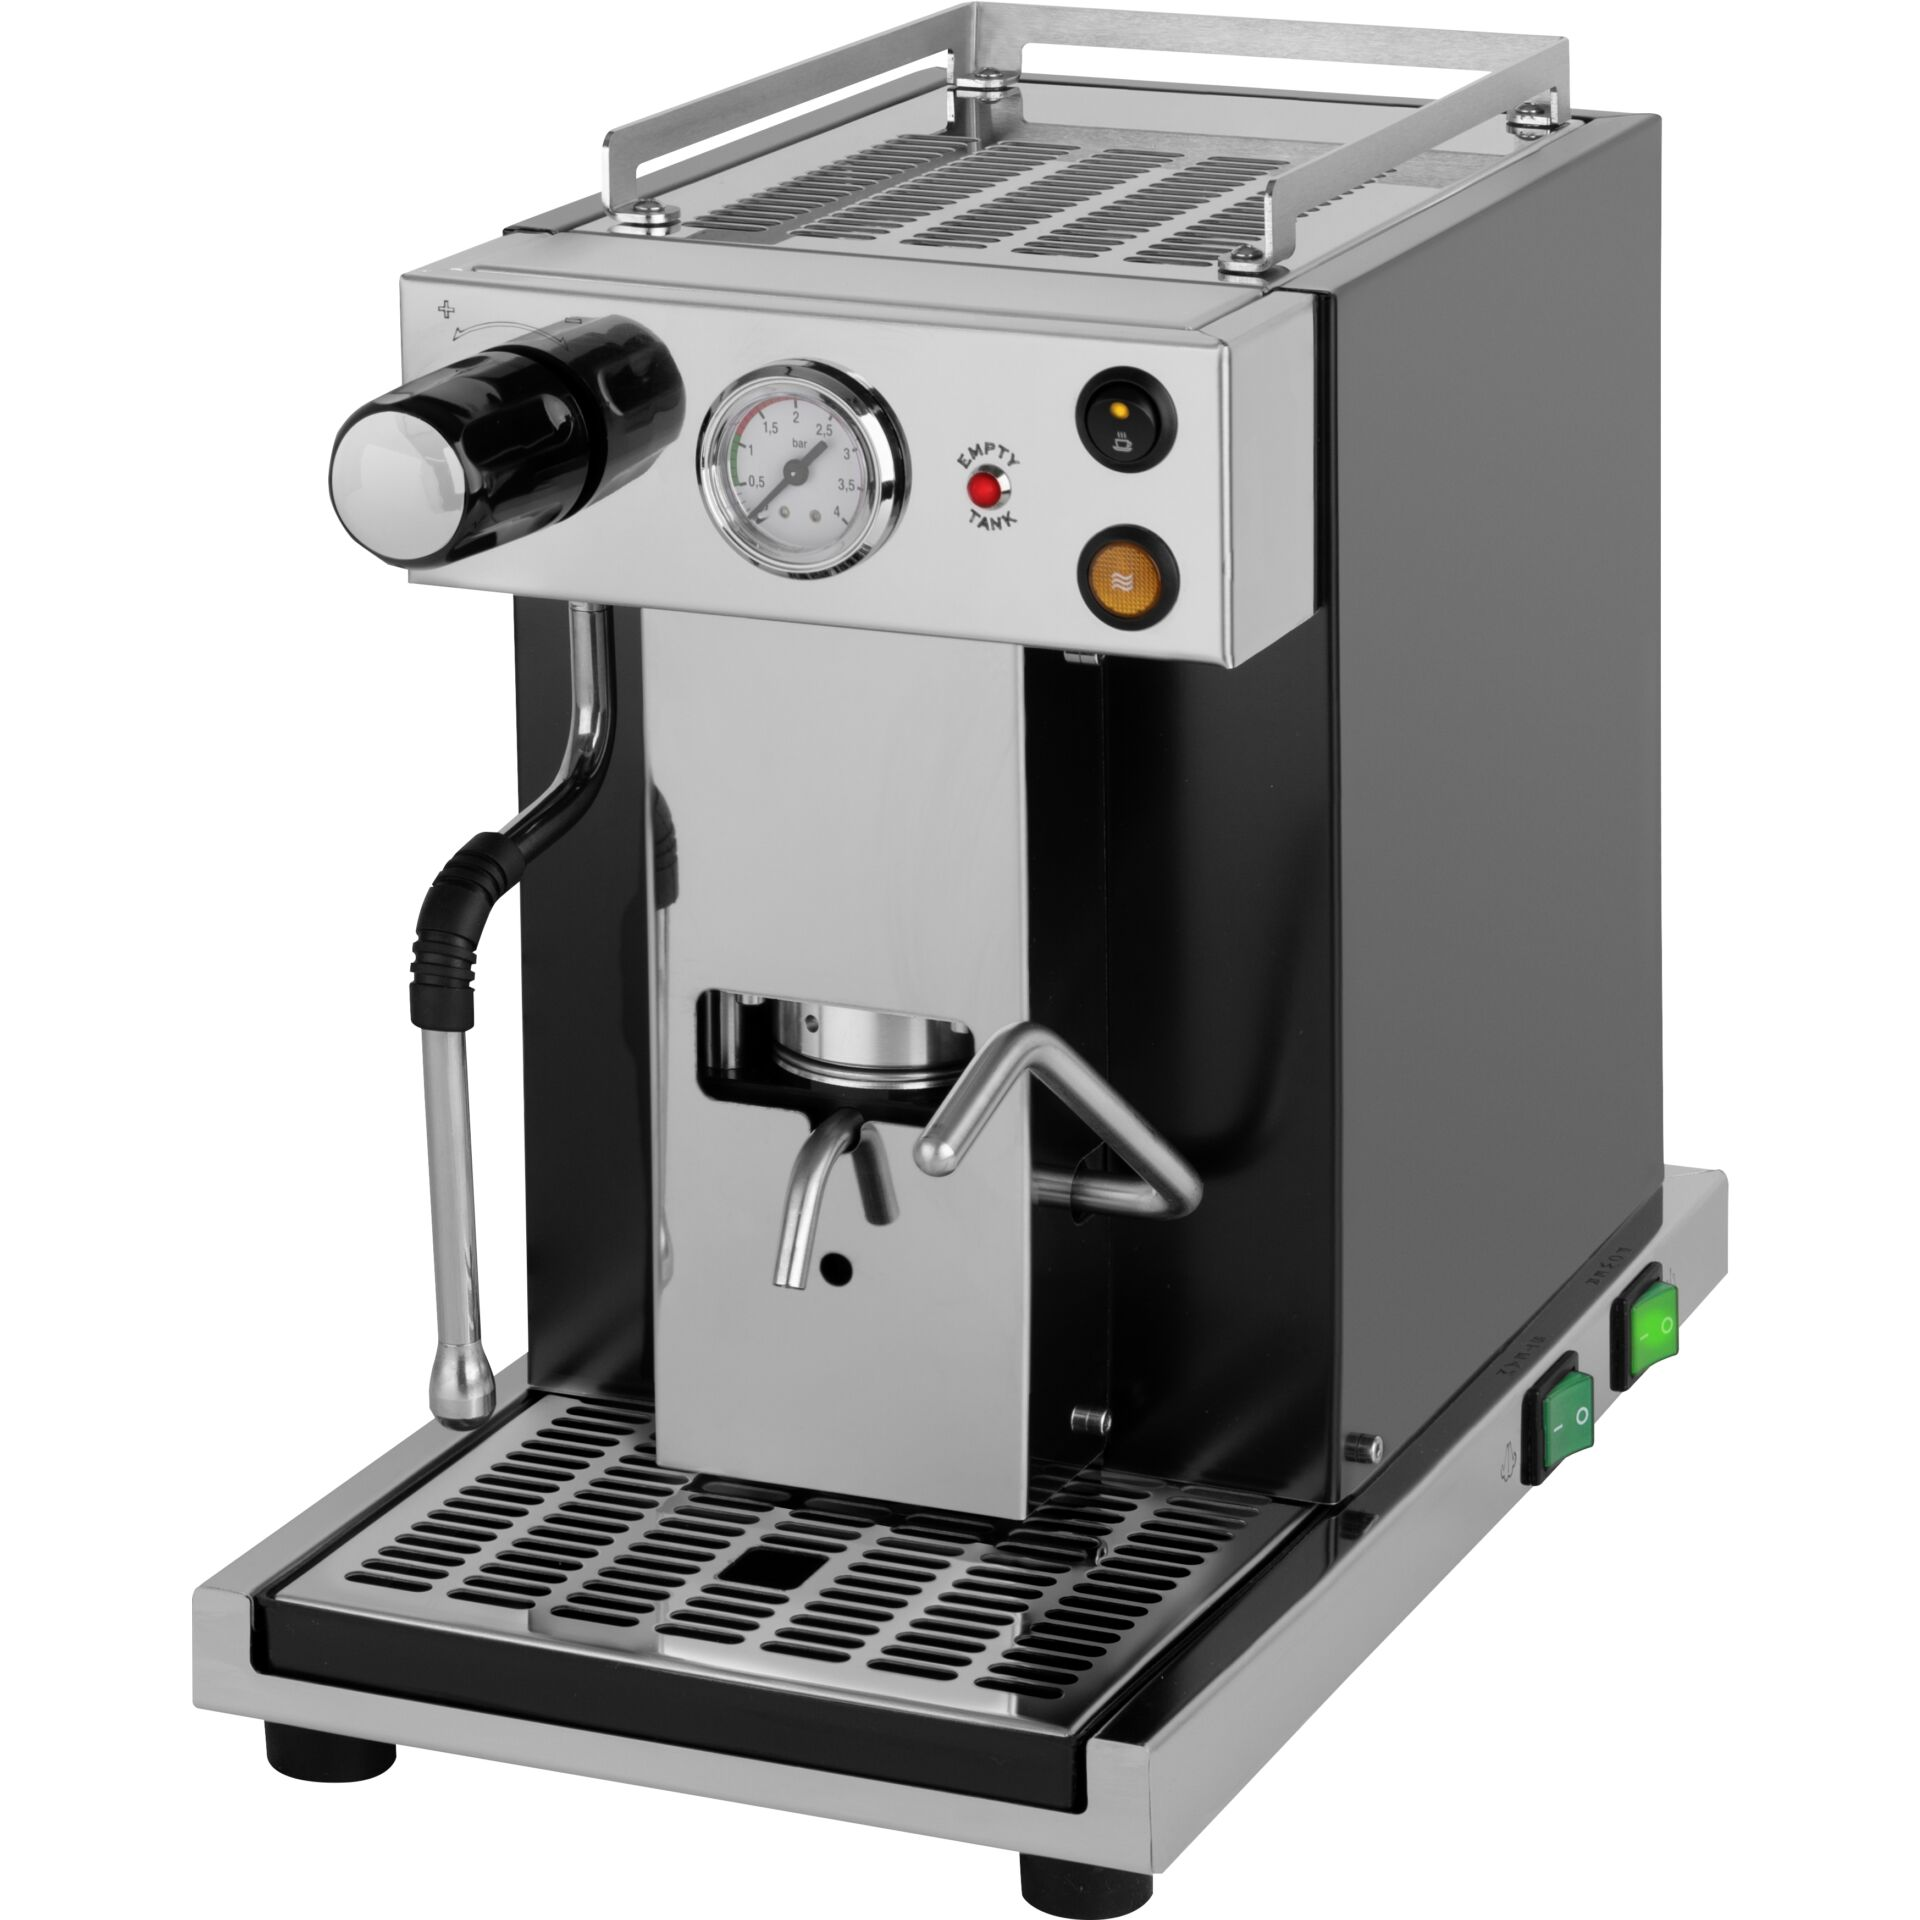 Flytek Click Pro manuale ESE Pad-Kaffeemaschine